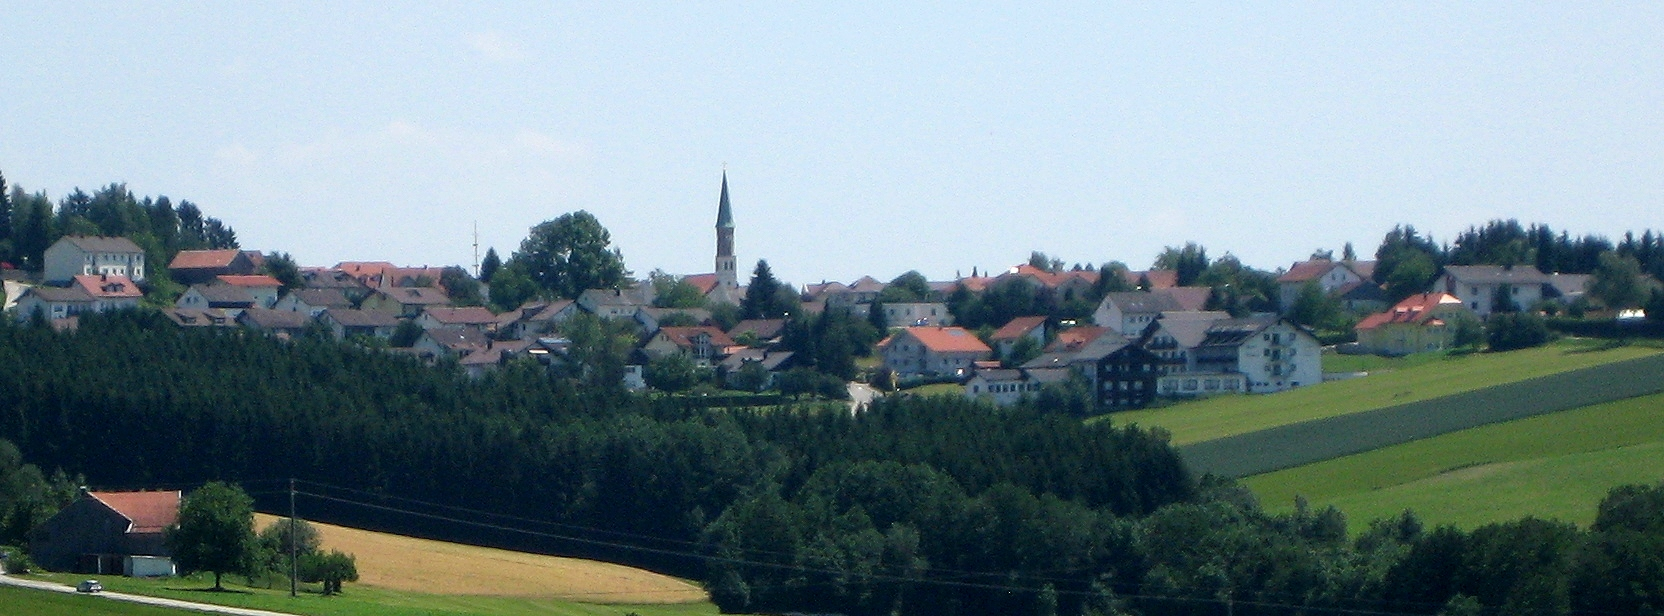 Büchlberg - Foto verlinkt via Wikipedia